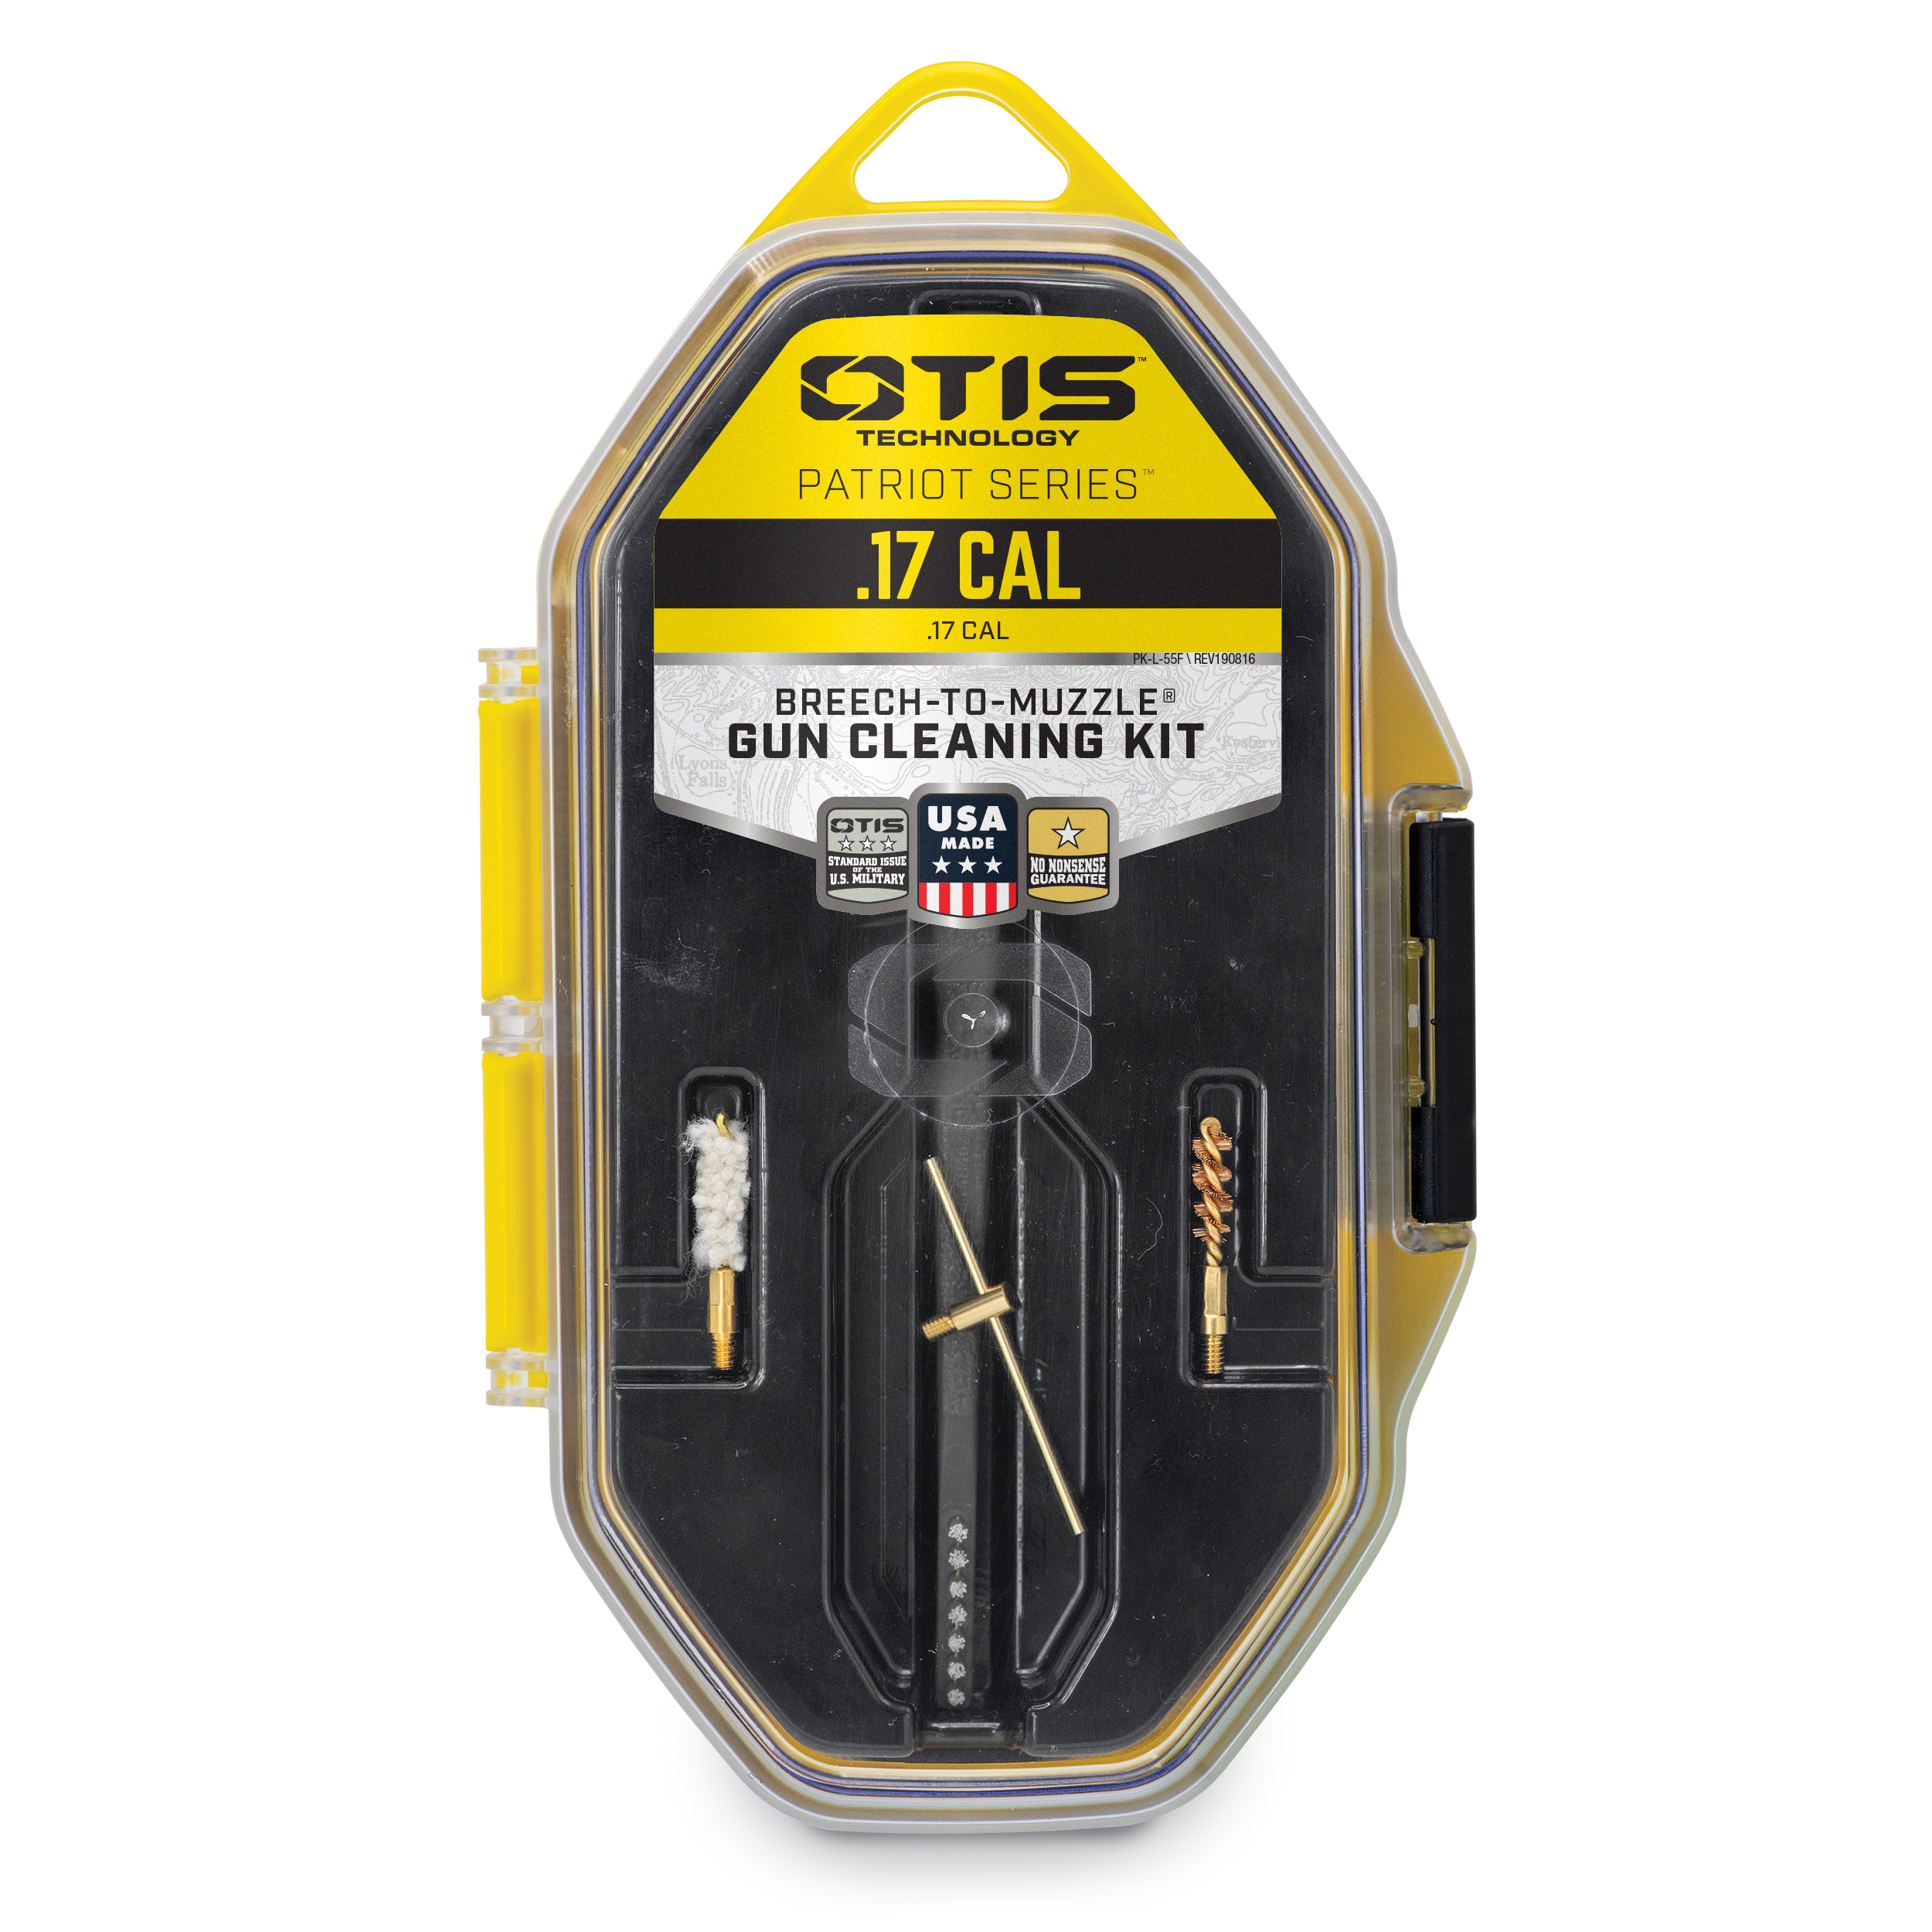 .17 cal Patriot Gun Cleaning Kit